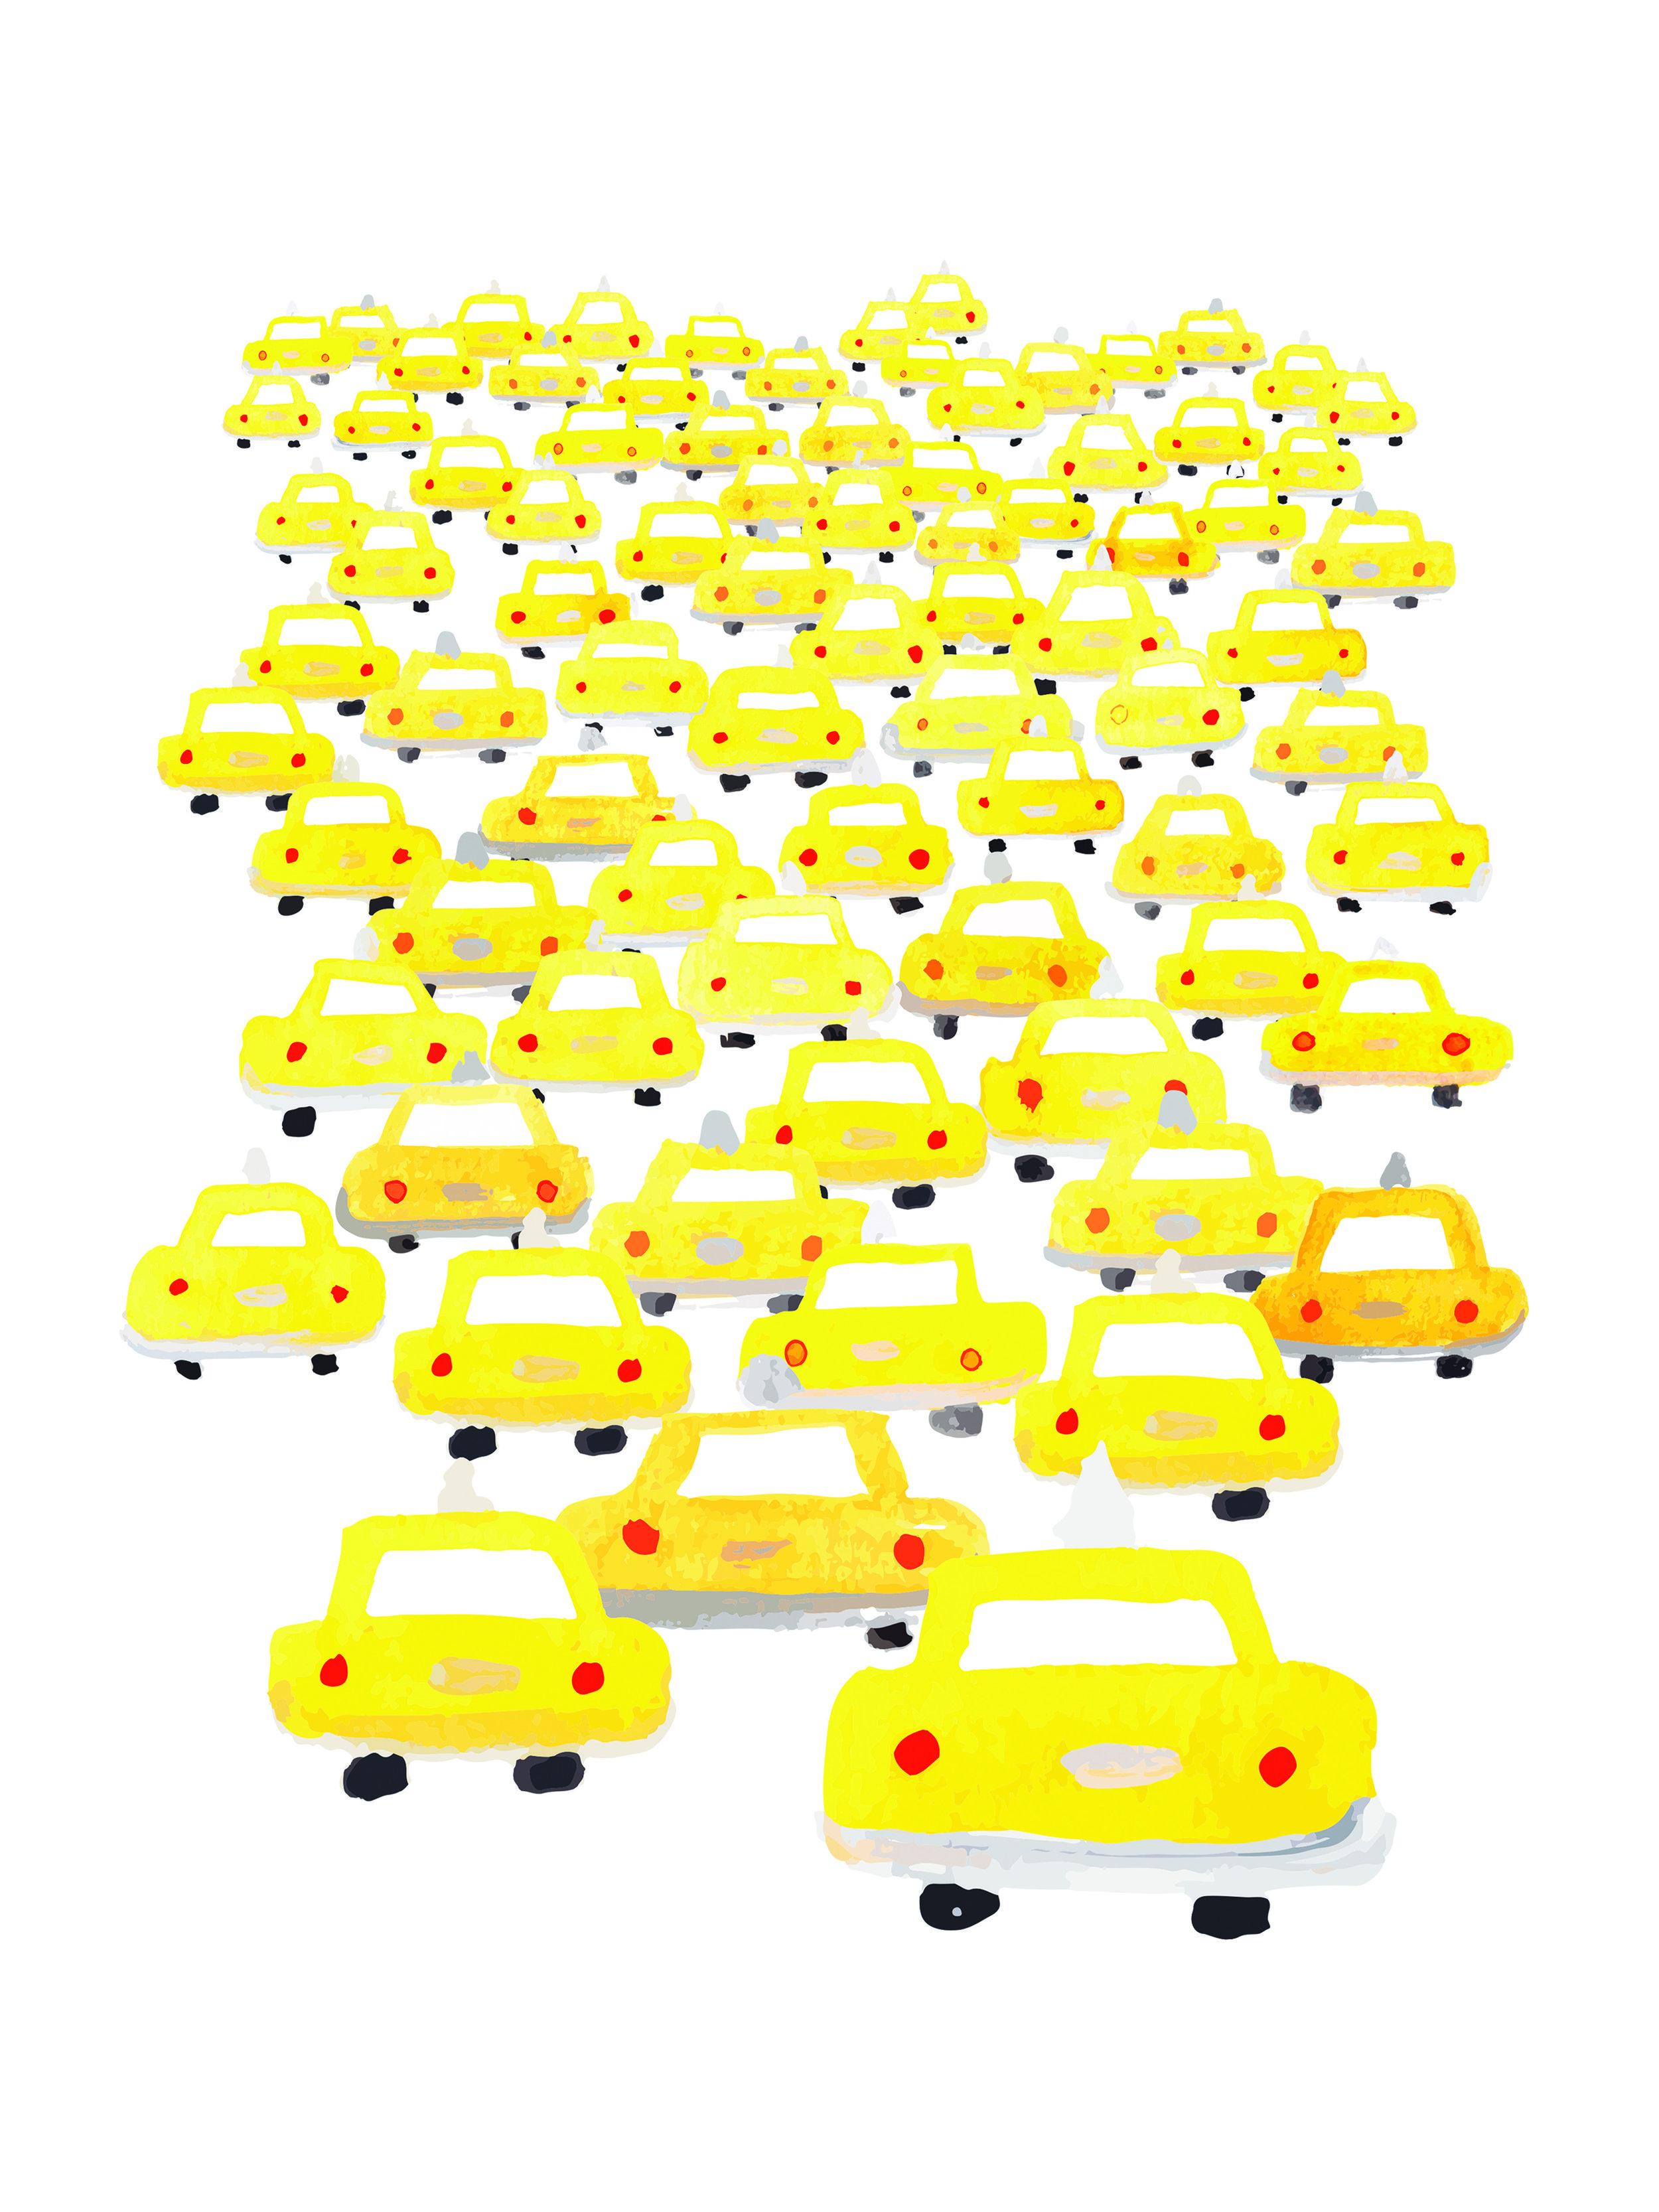 Taxi_Print_12by16.jpg